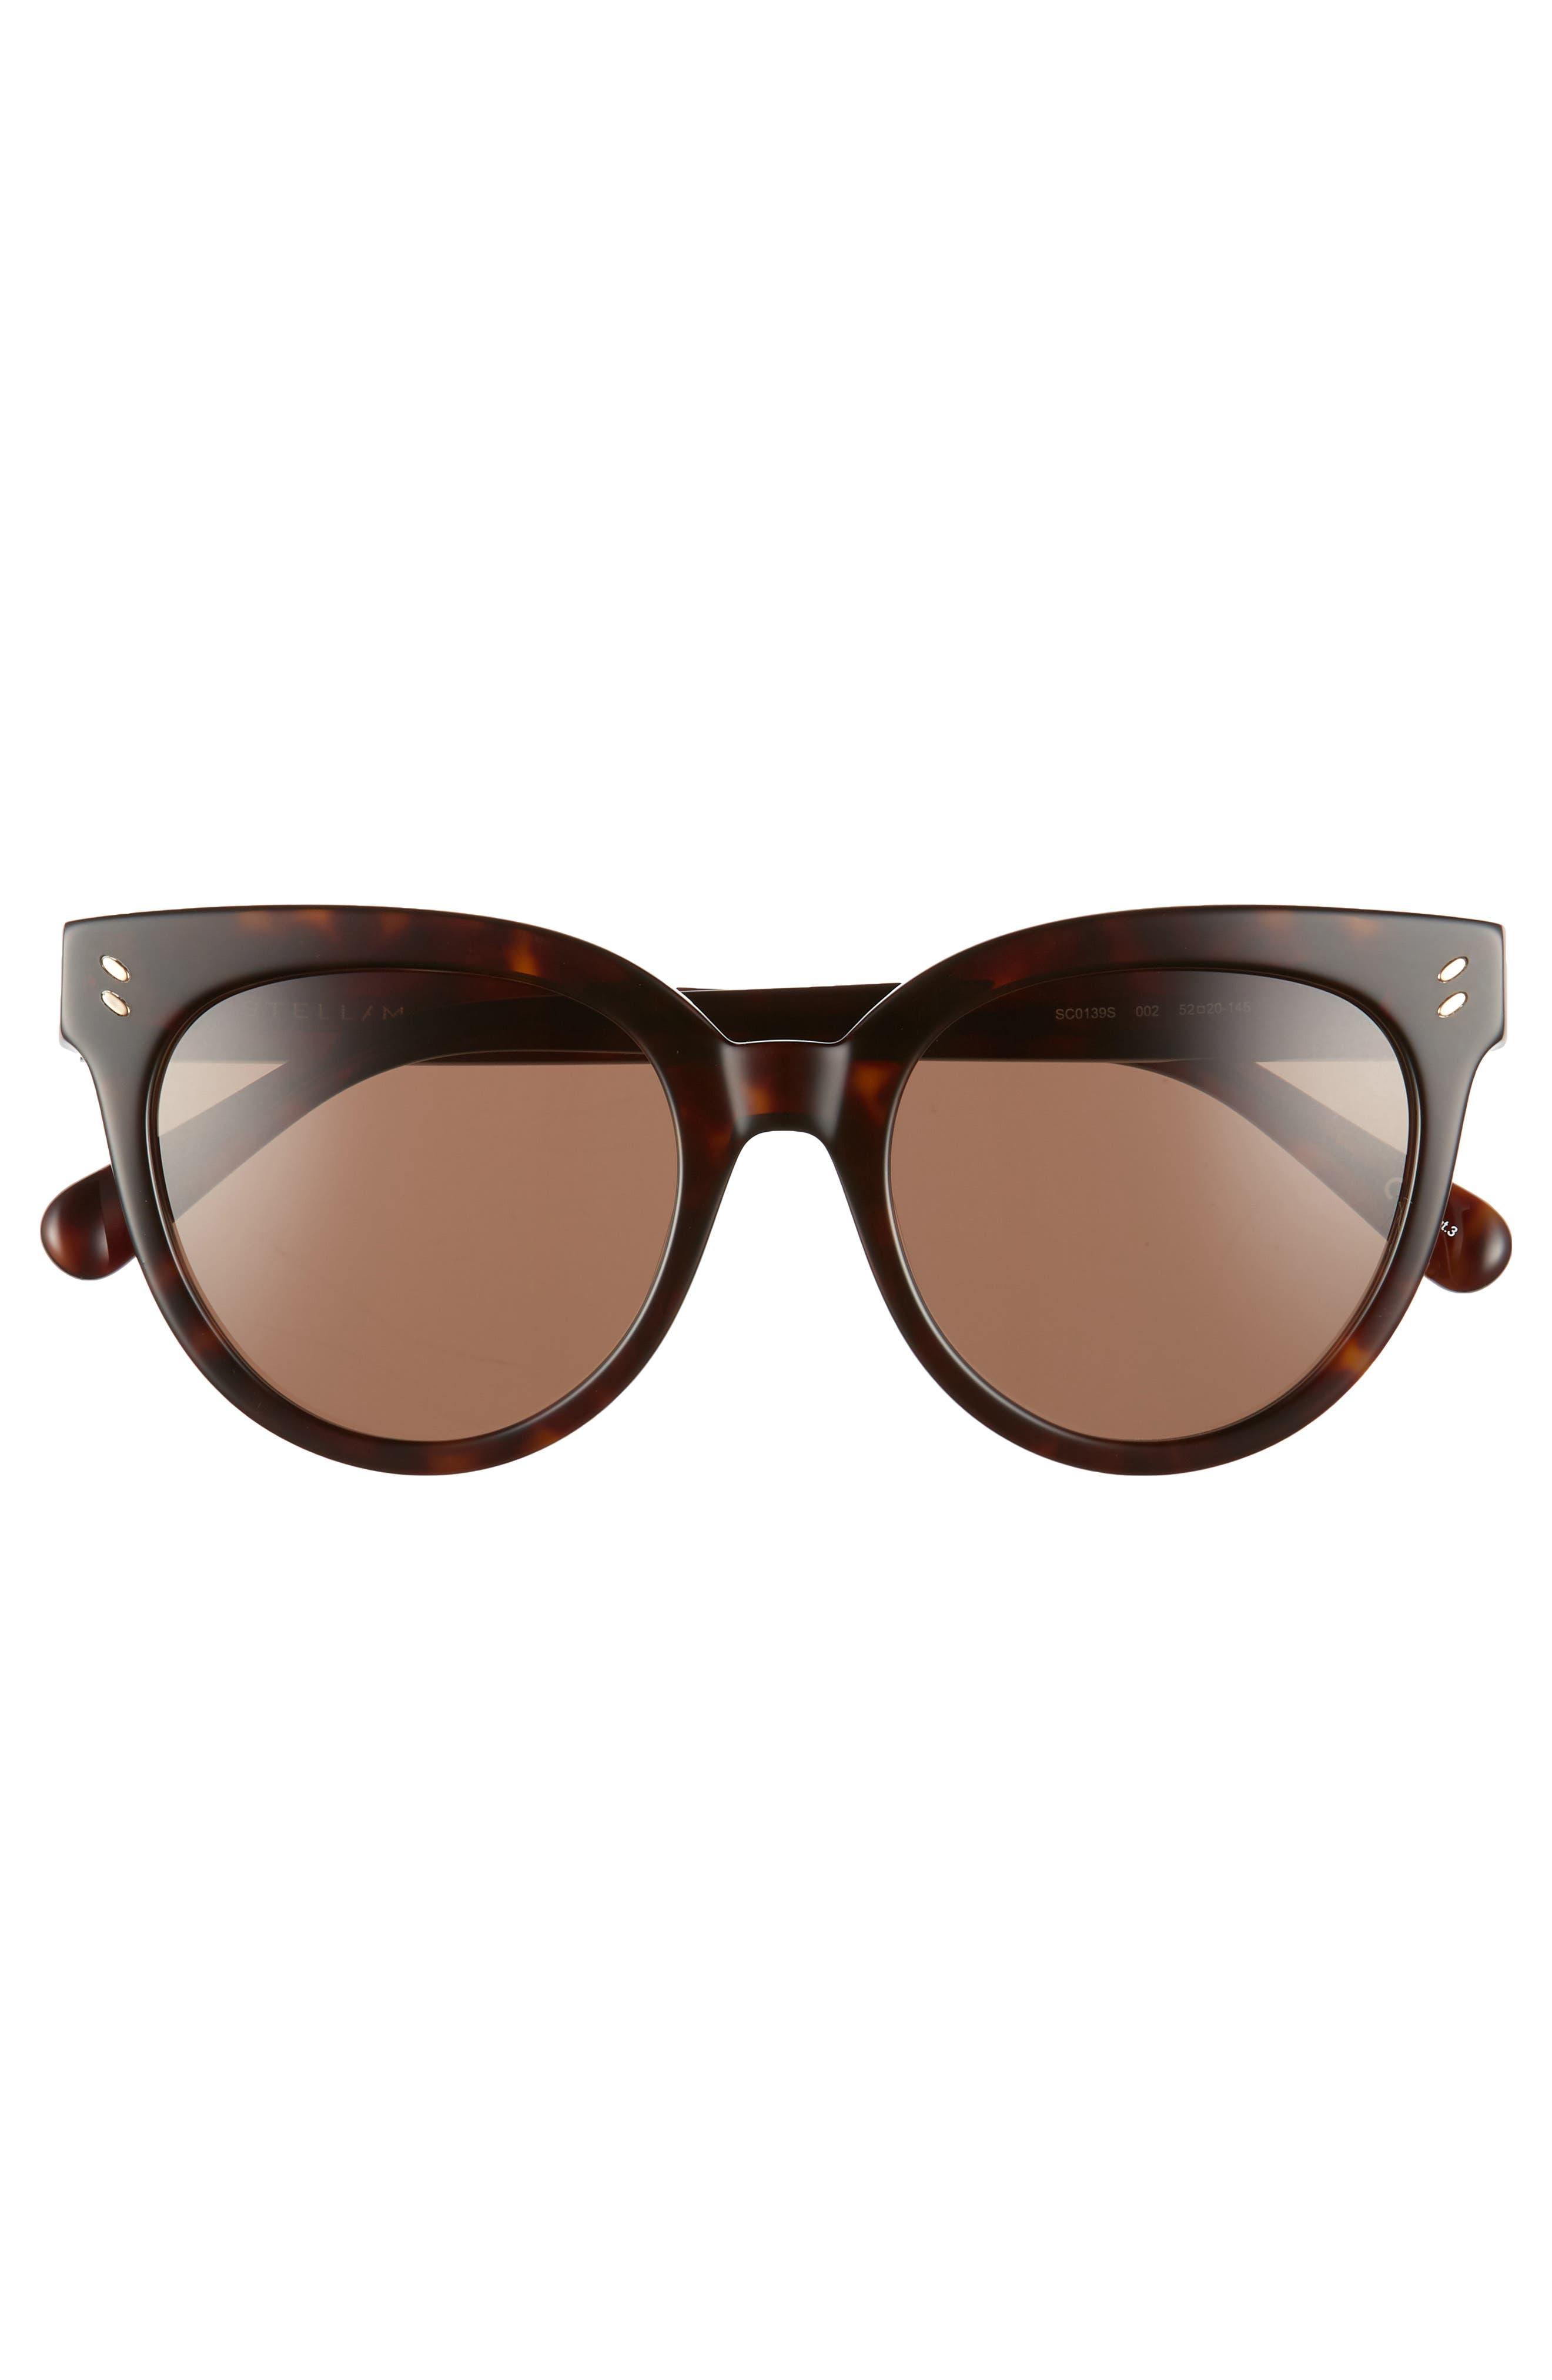 52mm Sunglasses,                             Alternate thumbnail 3, color,                             Shiny Dark Havana